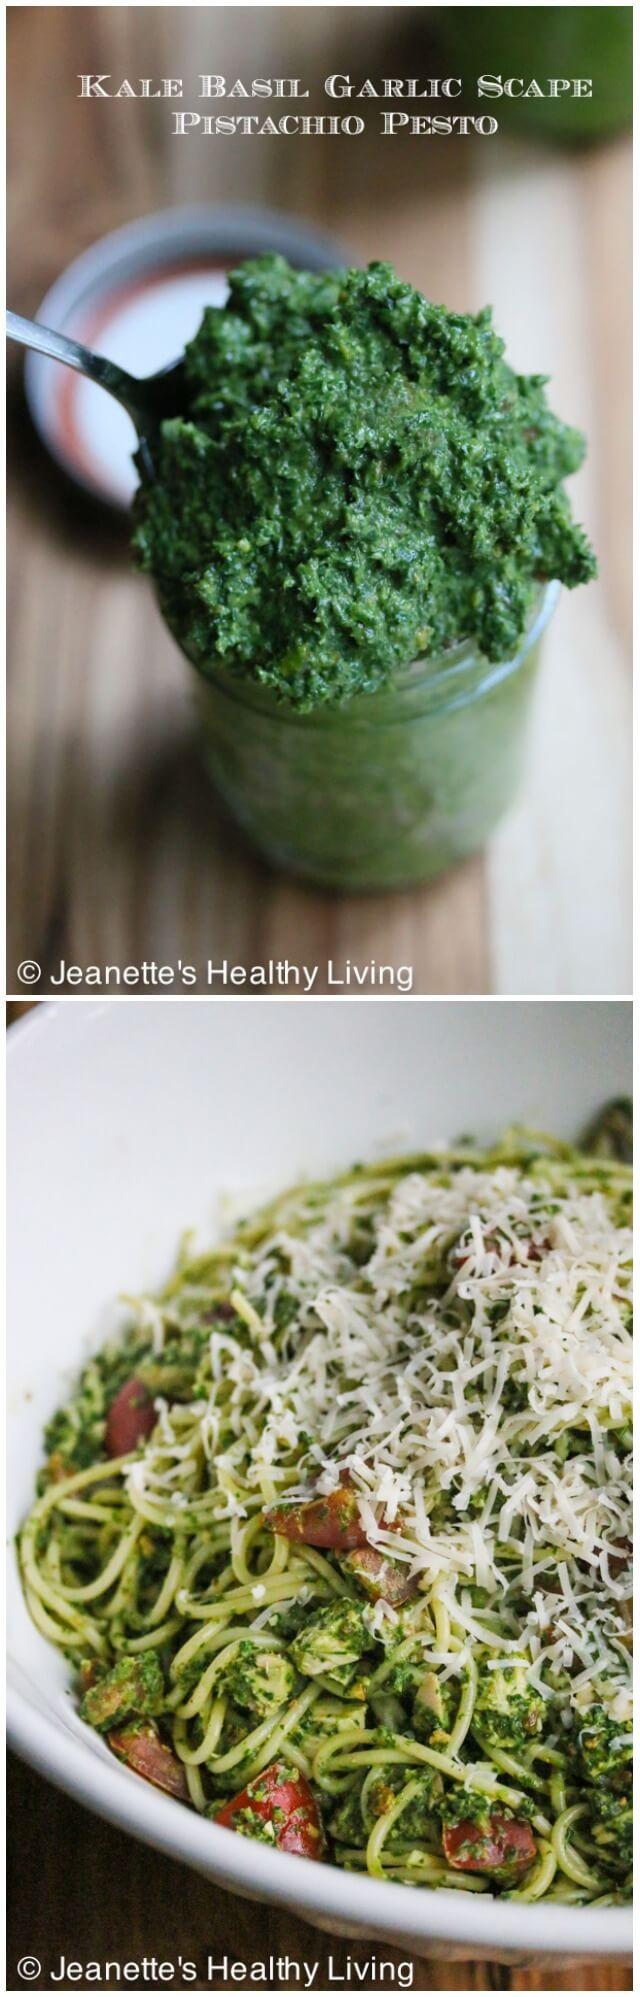 Kale Basil Garlic Scape Pistachio Pesto © Jeanette's Healthy Living